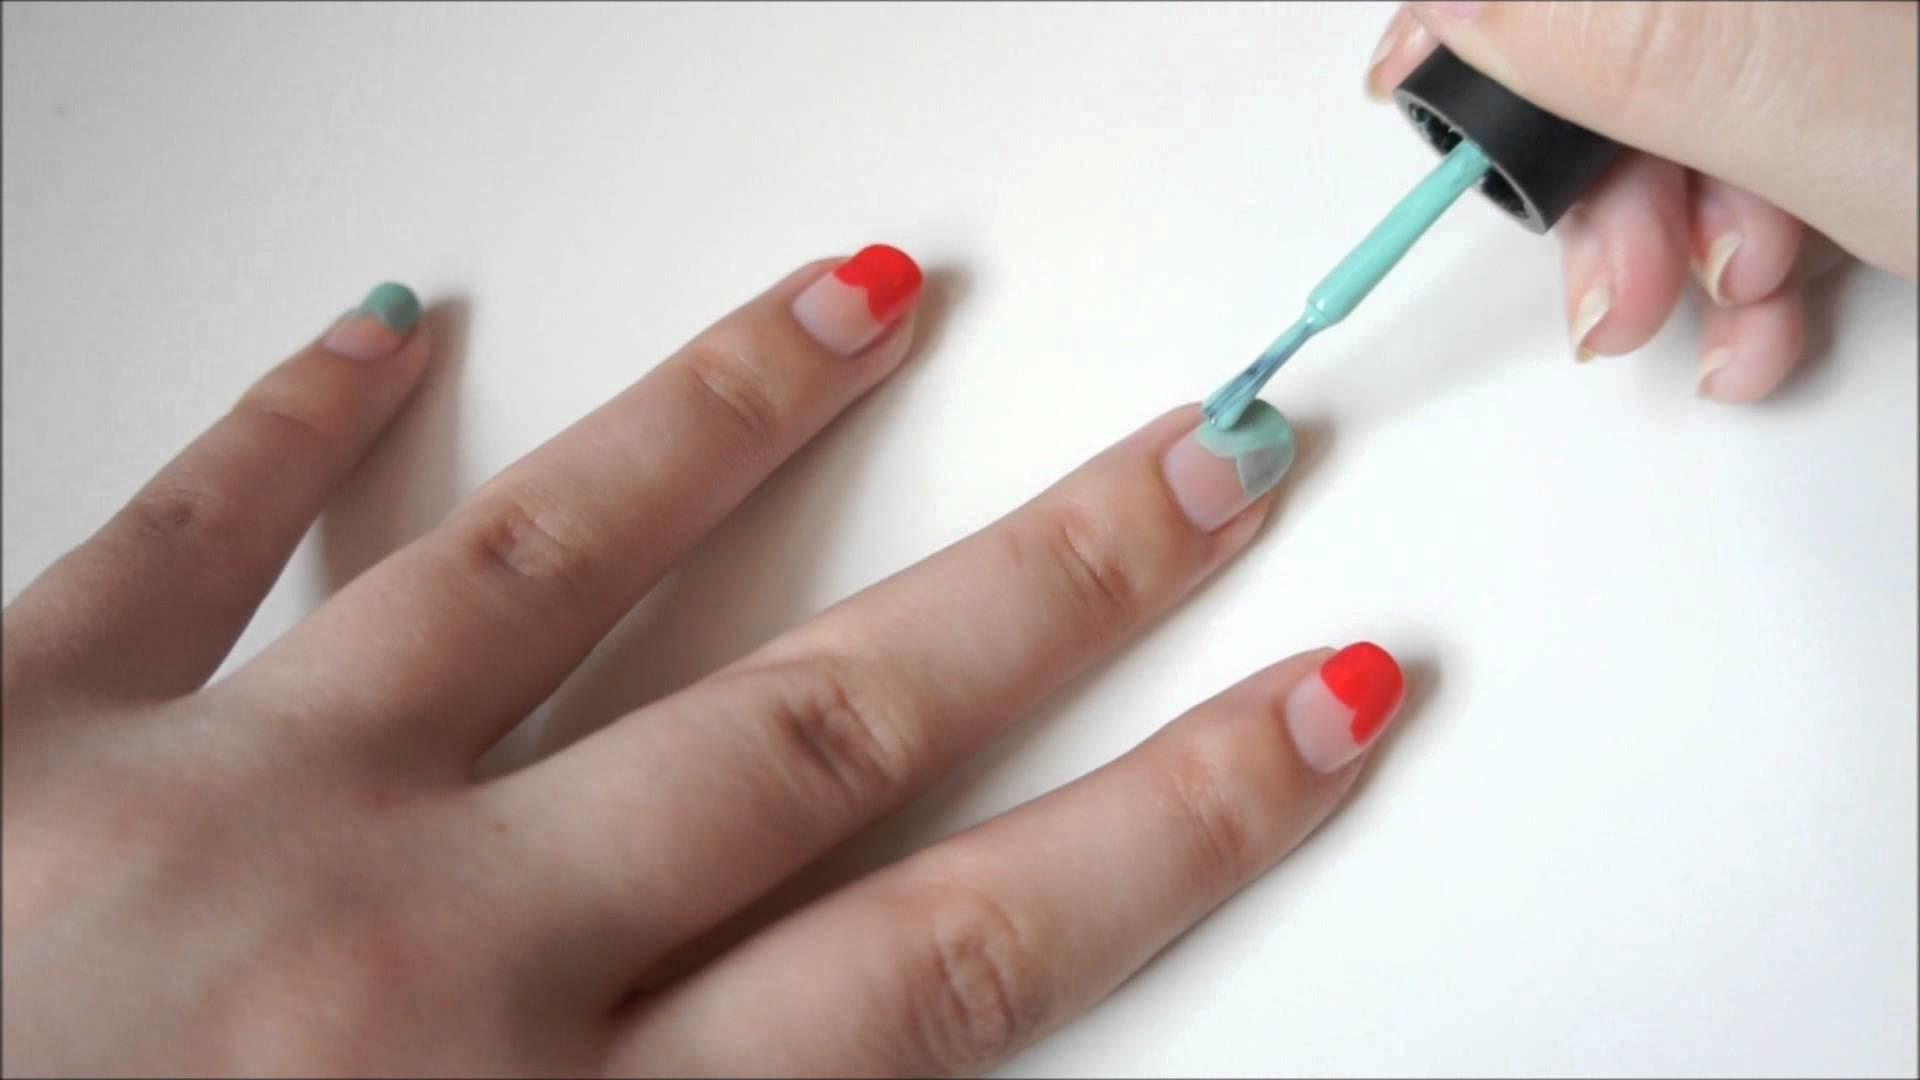 DIY Nail Art Tutorial: Apple Nail Art